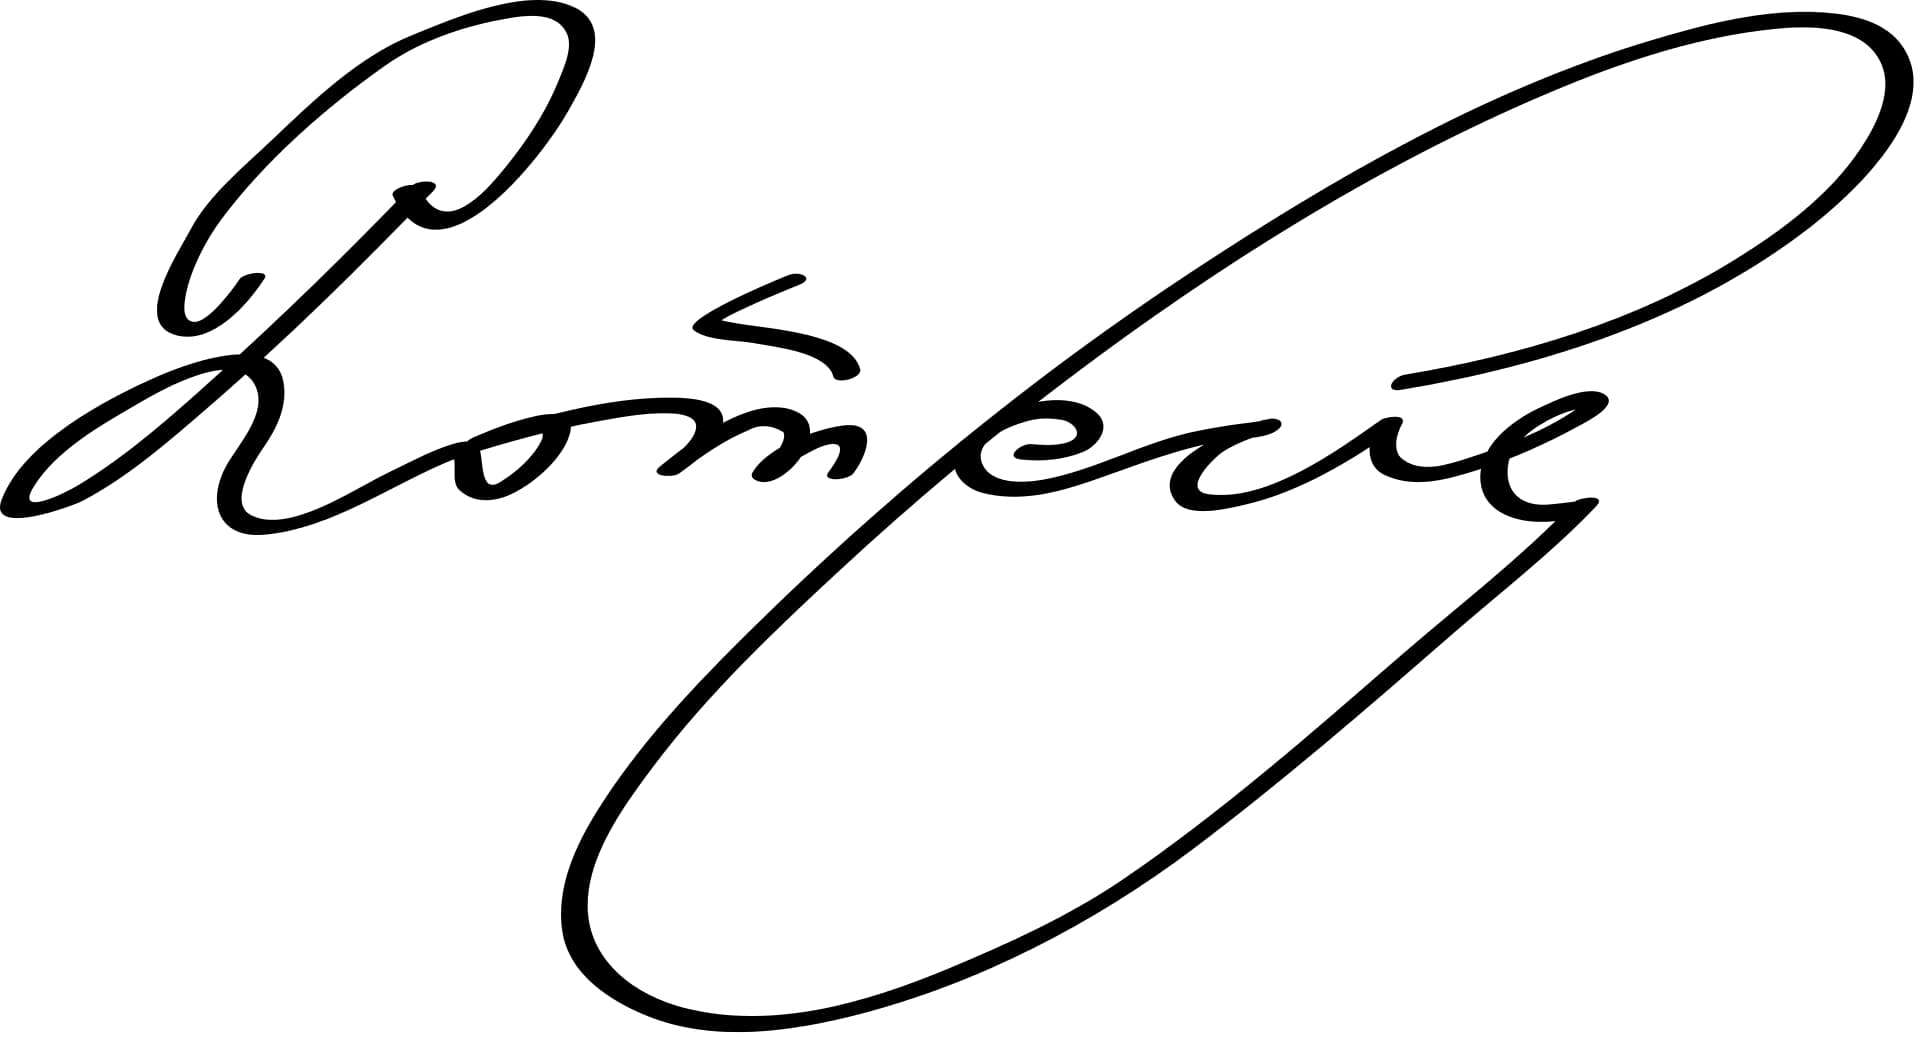 Henri Poincaré Signature